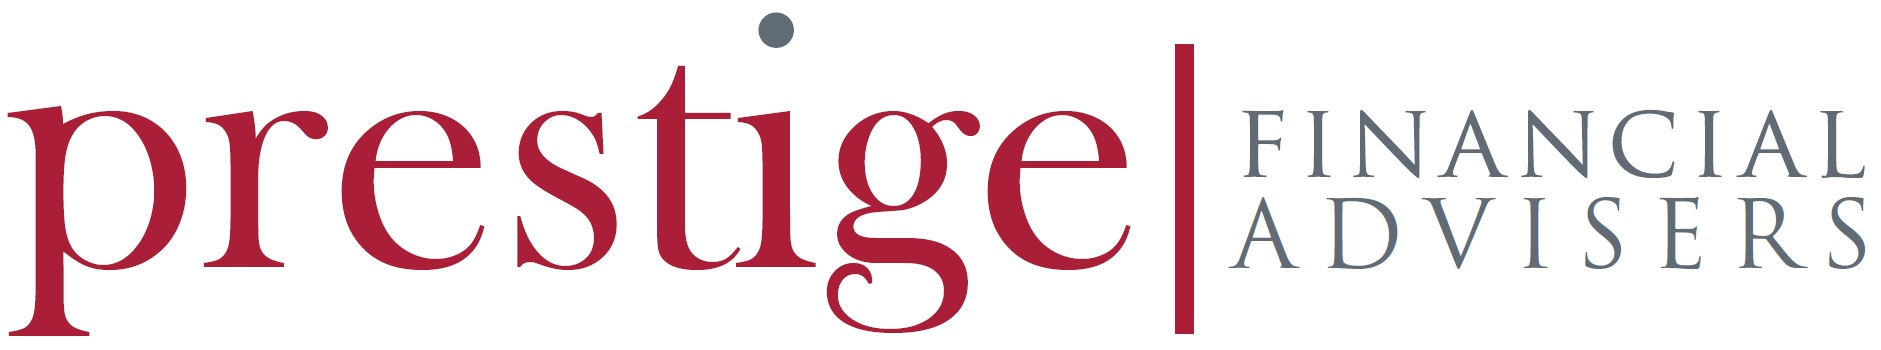 Read Prestige Financial Advisers Reviews